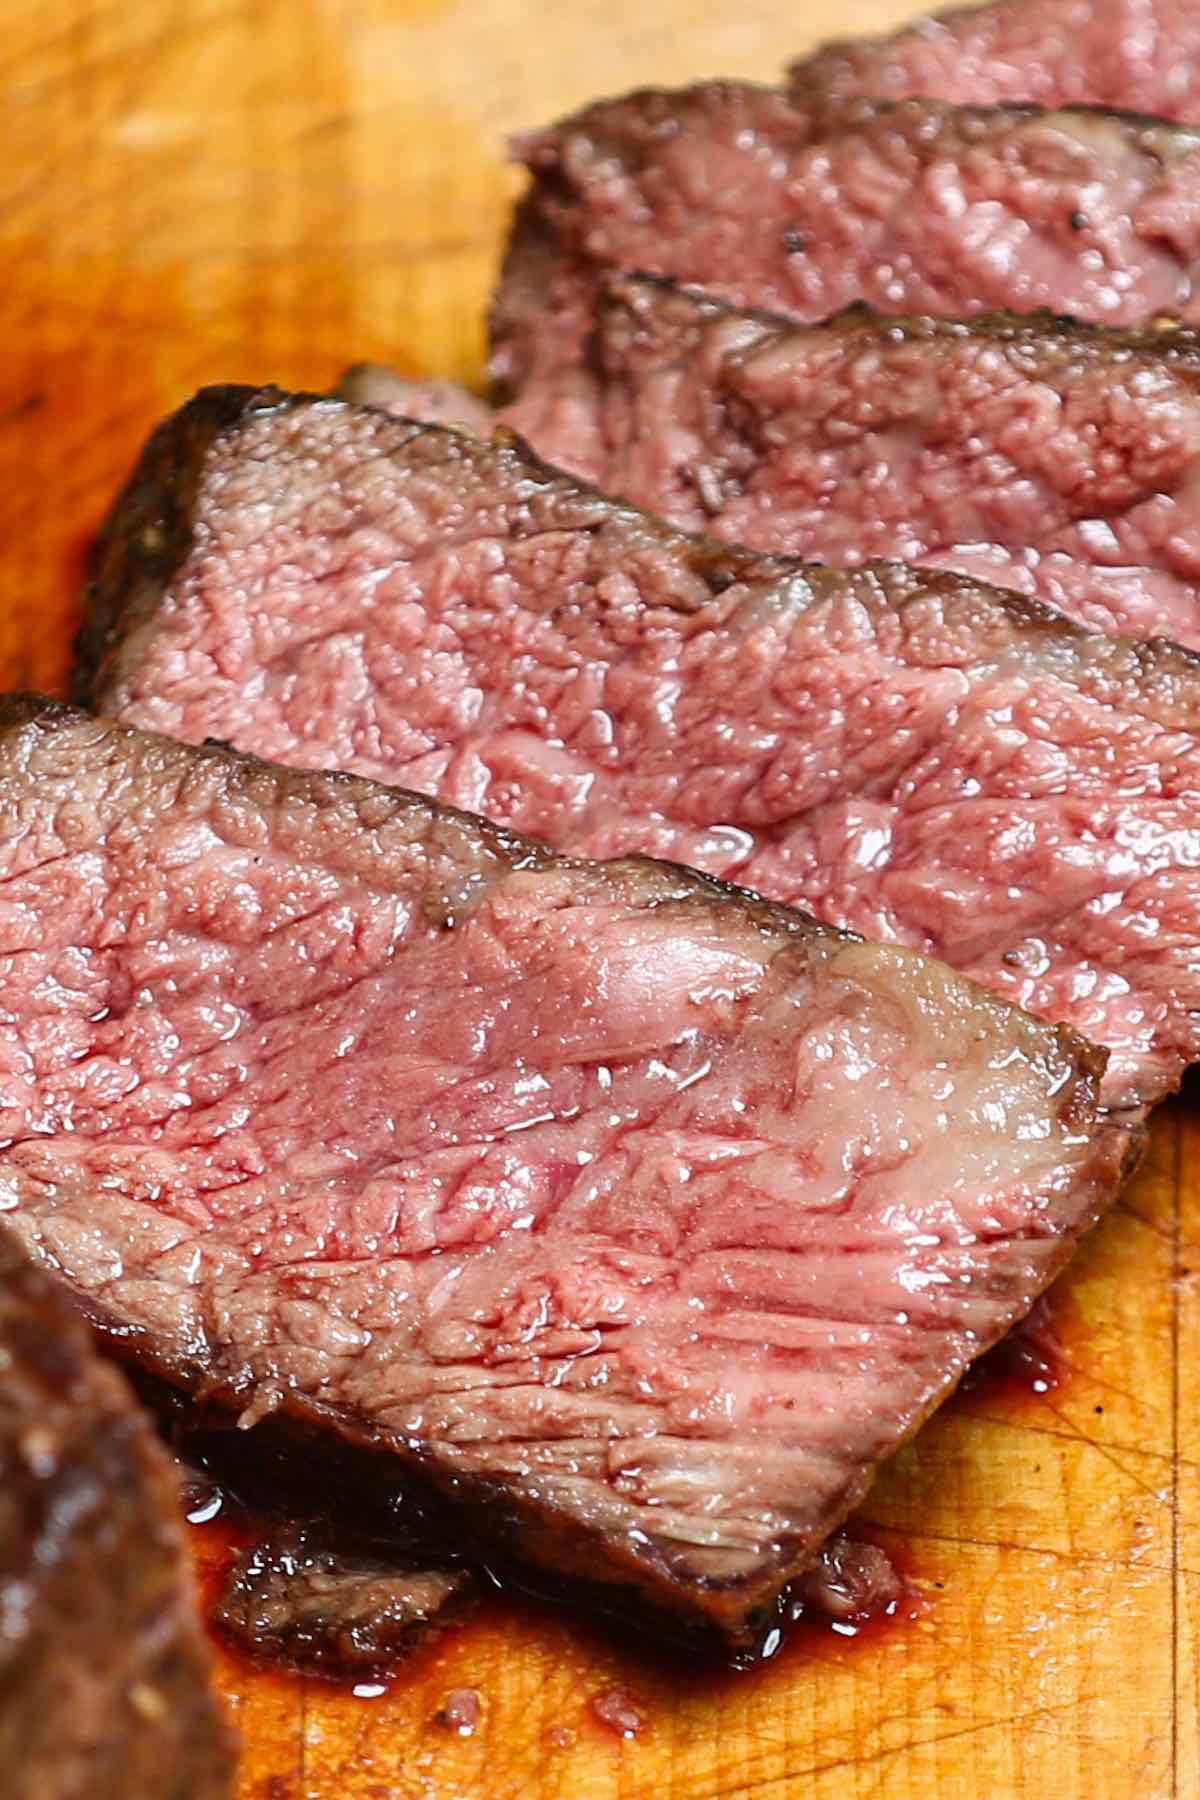 Slices of Denver steak cooked medium